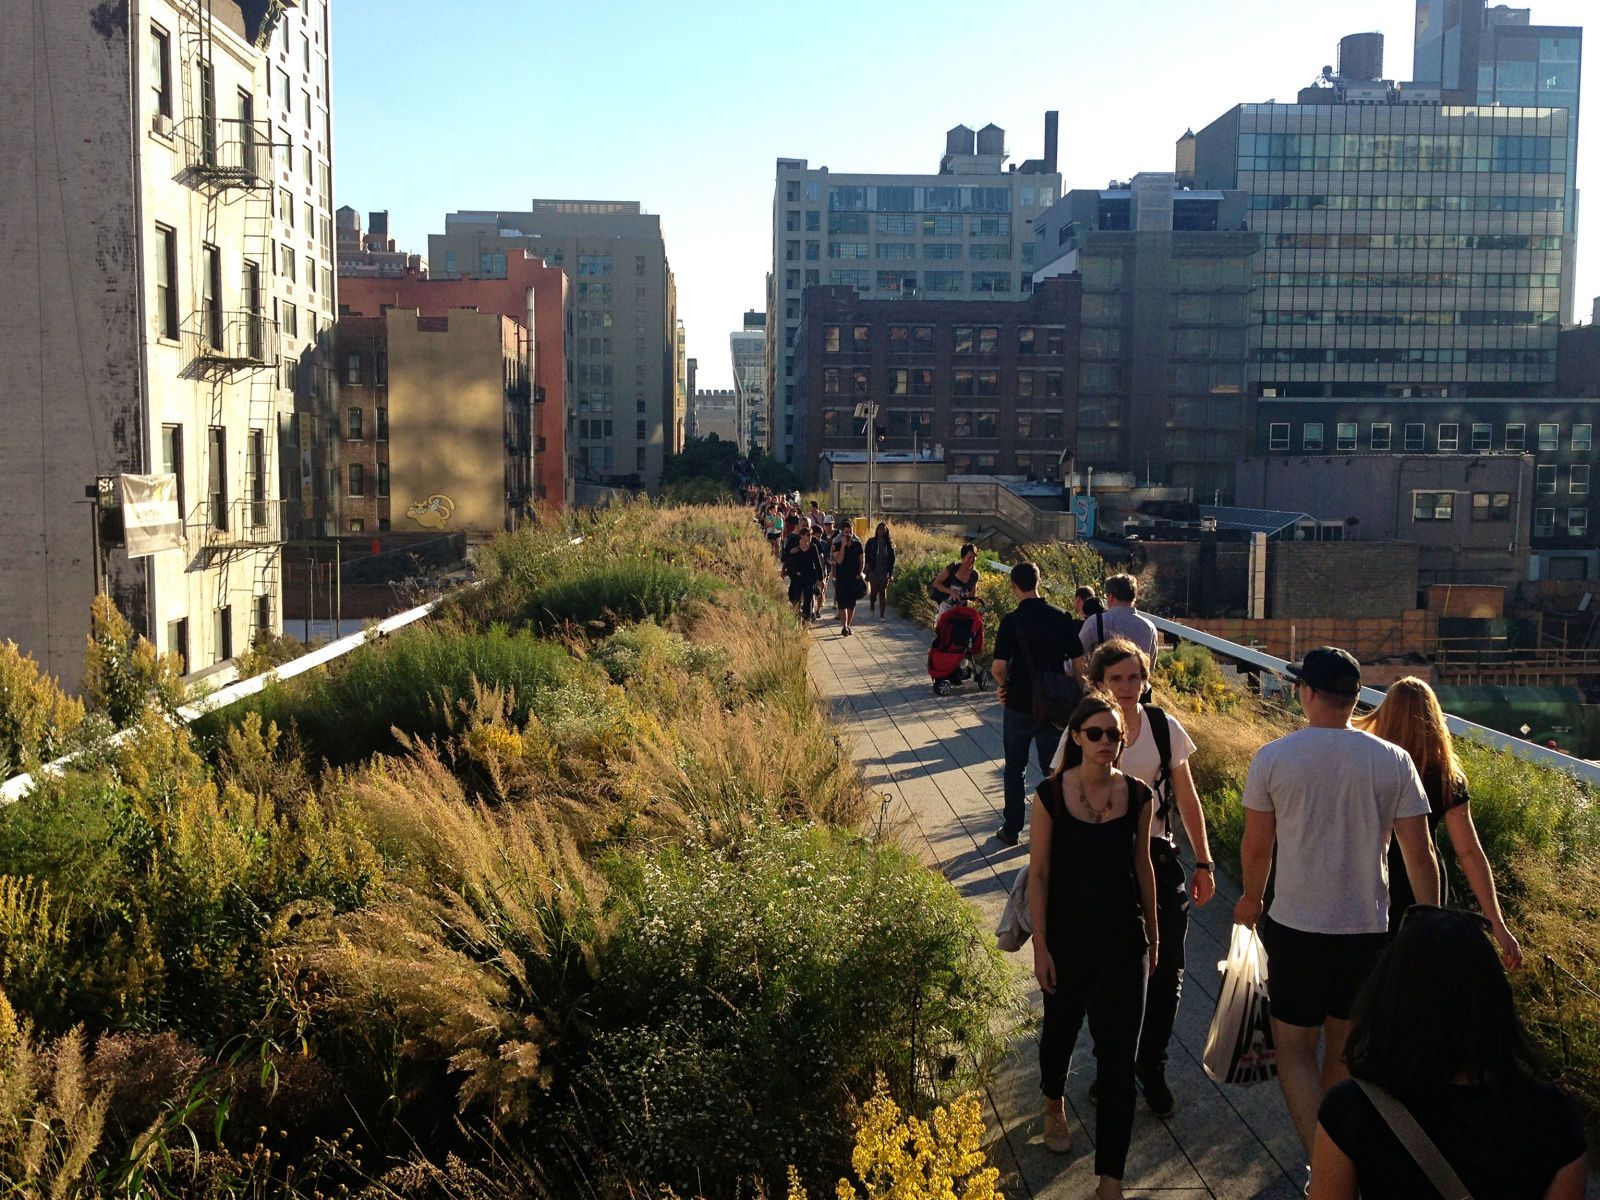 New York Tops the List of Most Walkable Cities  - ELLEDecor.com